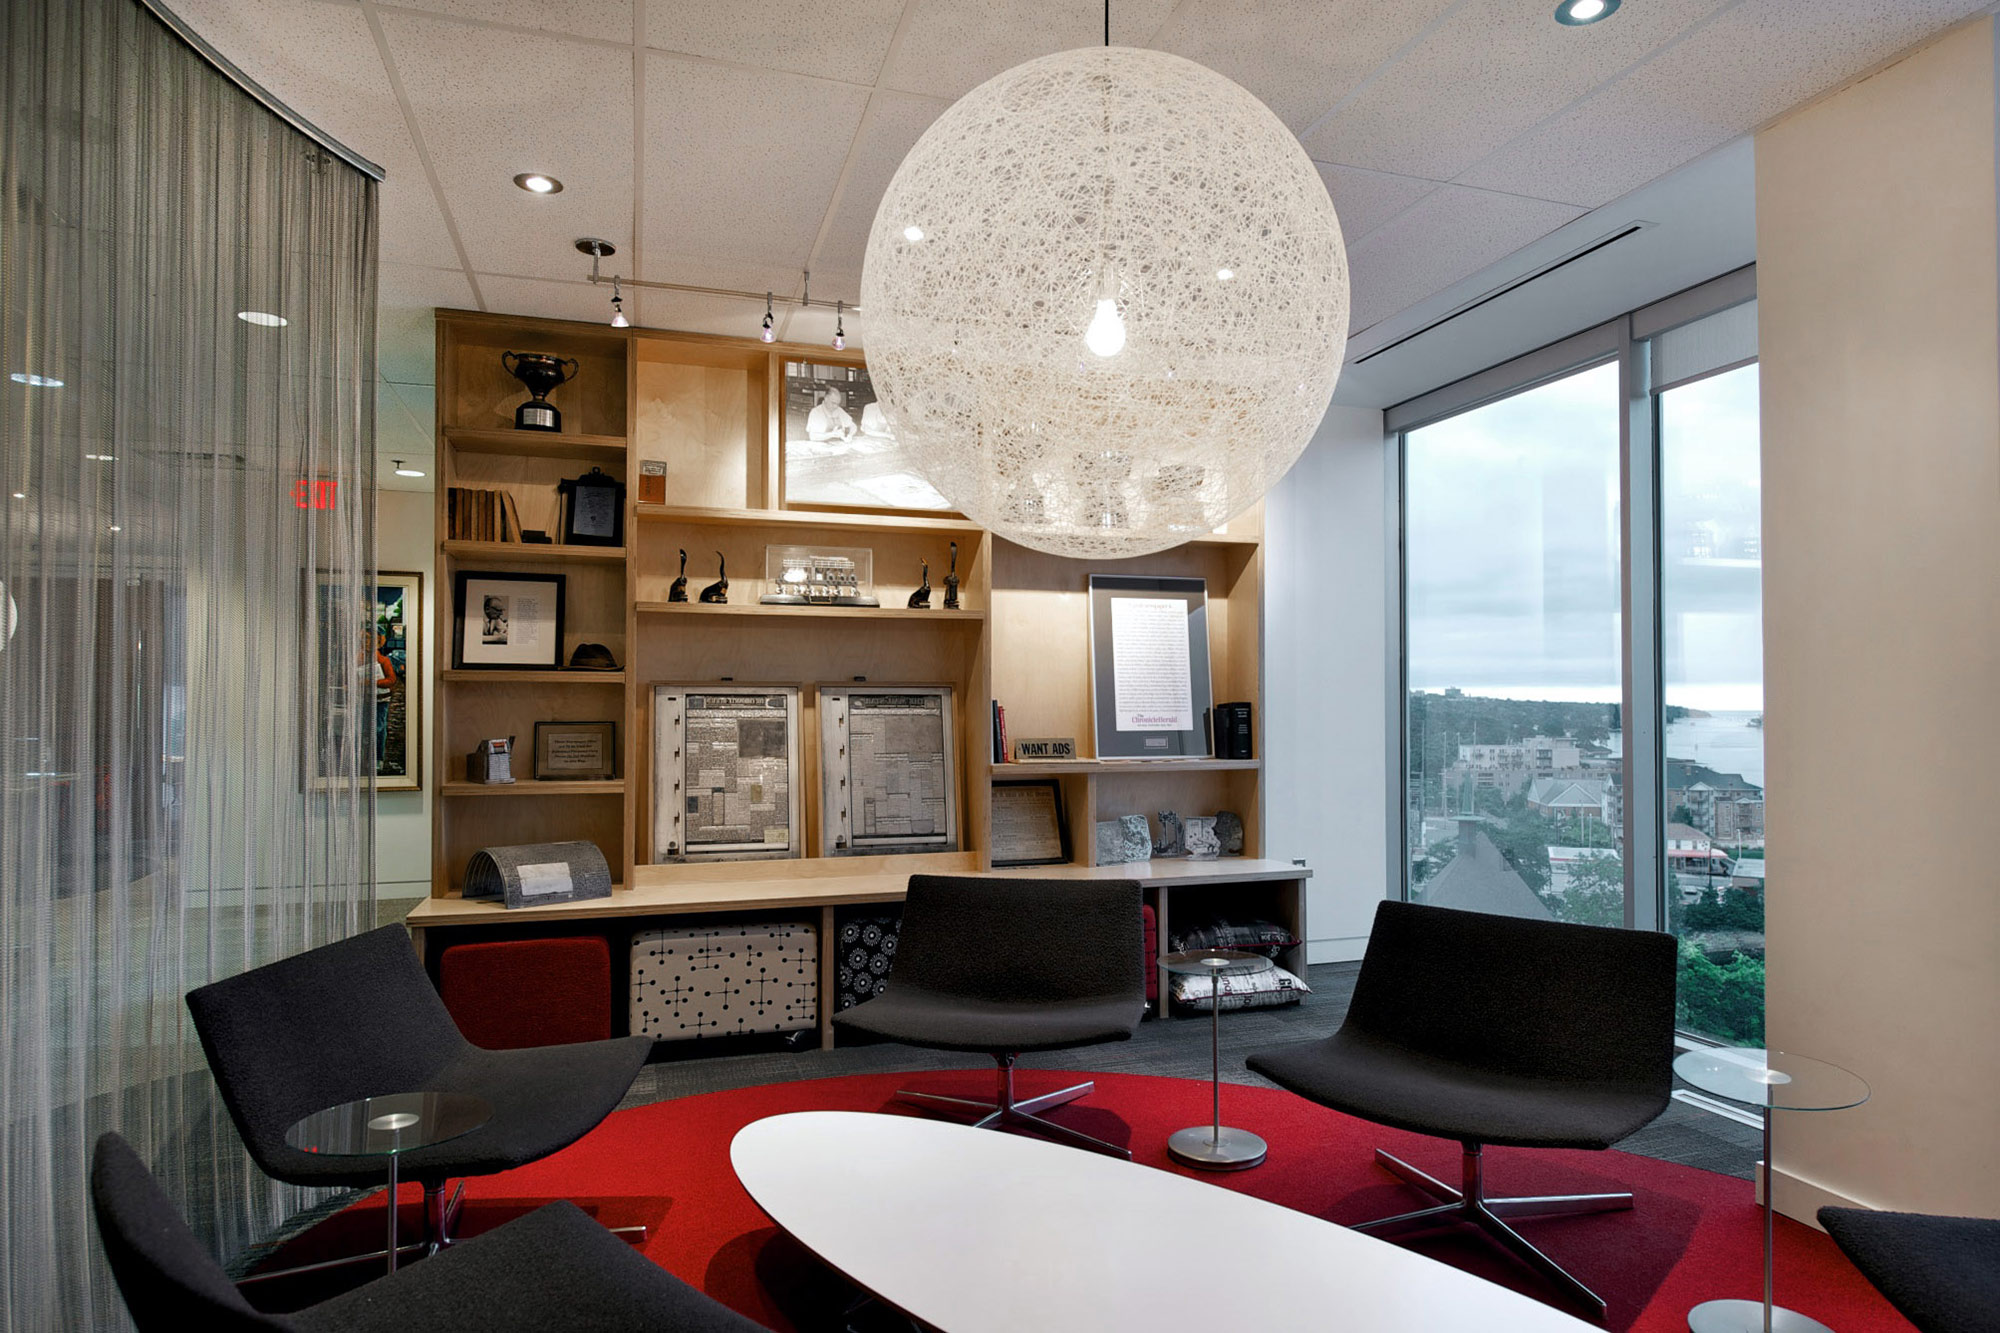 interior-design-media-office-common-area.jpg